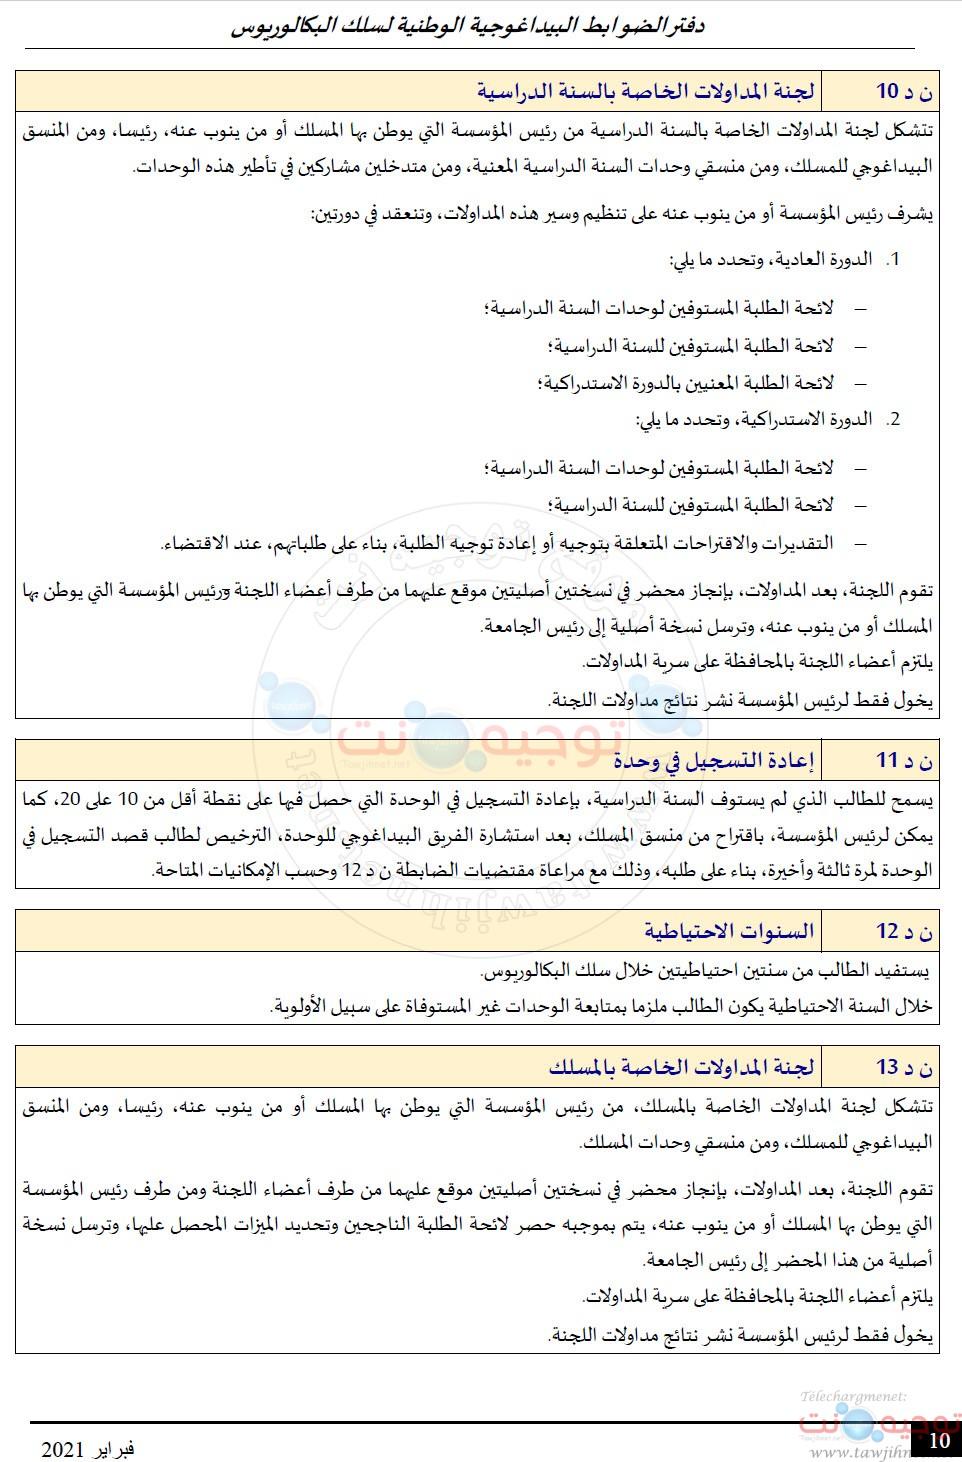 Bachelor-CNPN-normes-pedagoqiques-2021_Page_10.jpg